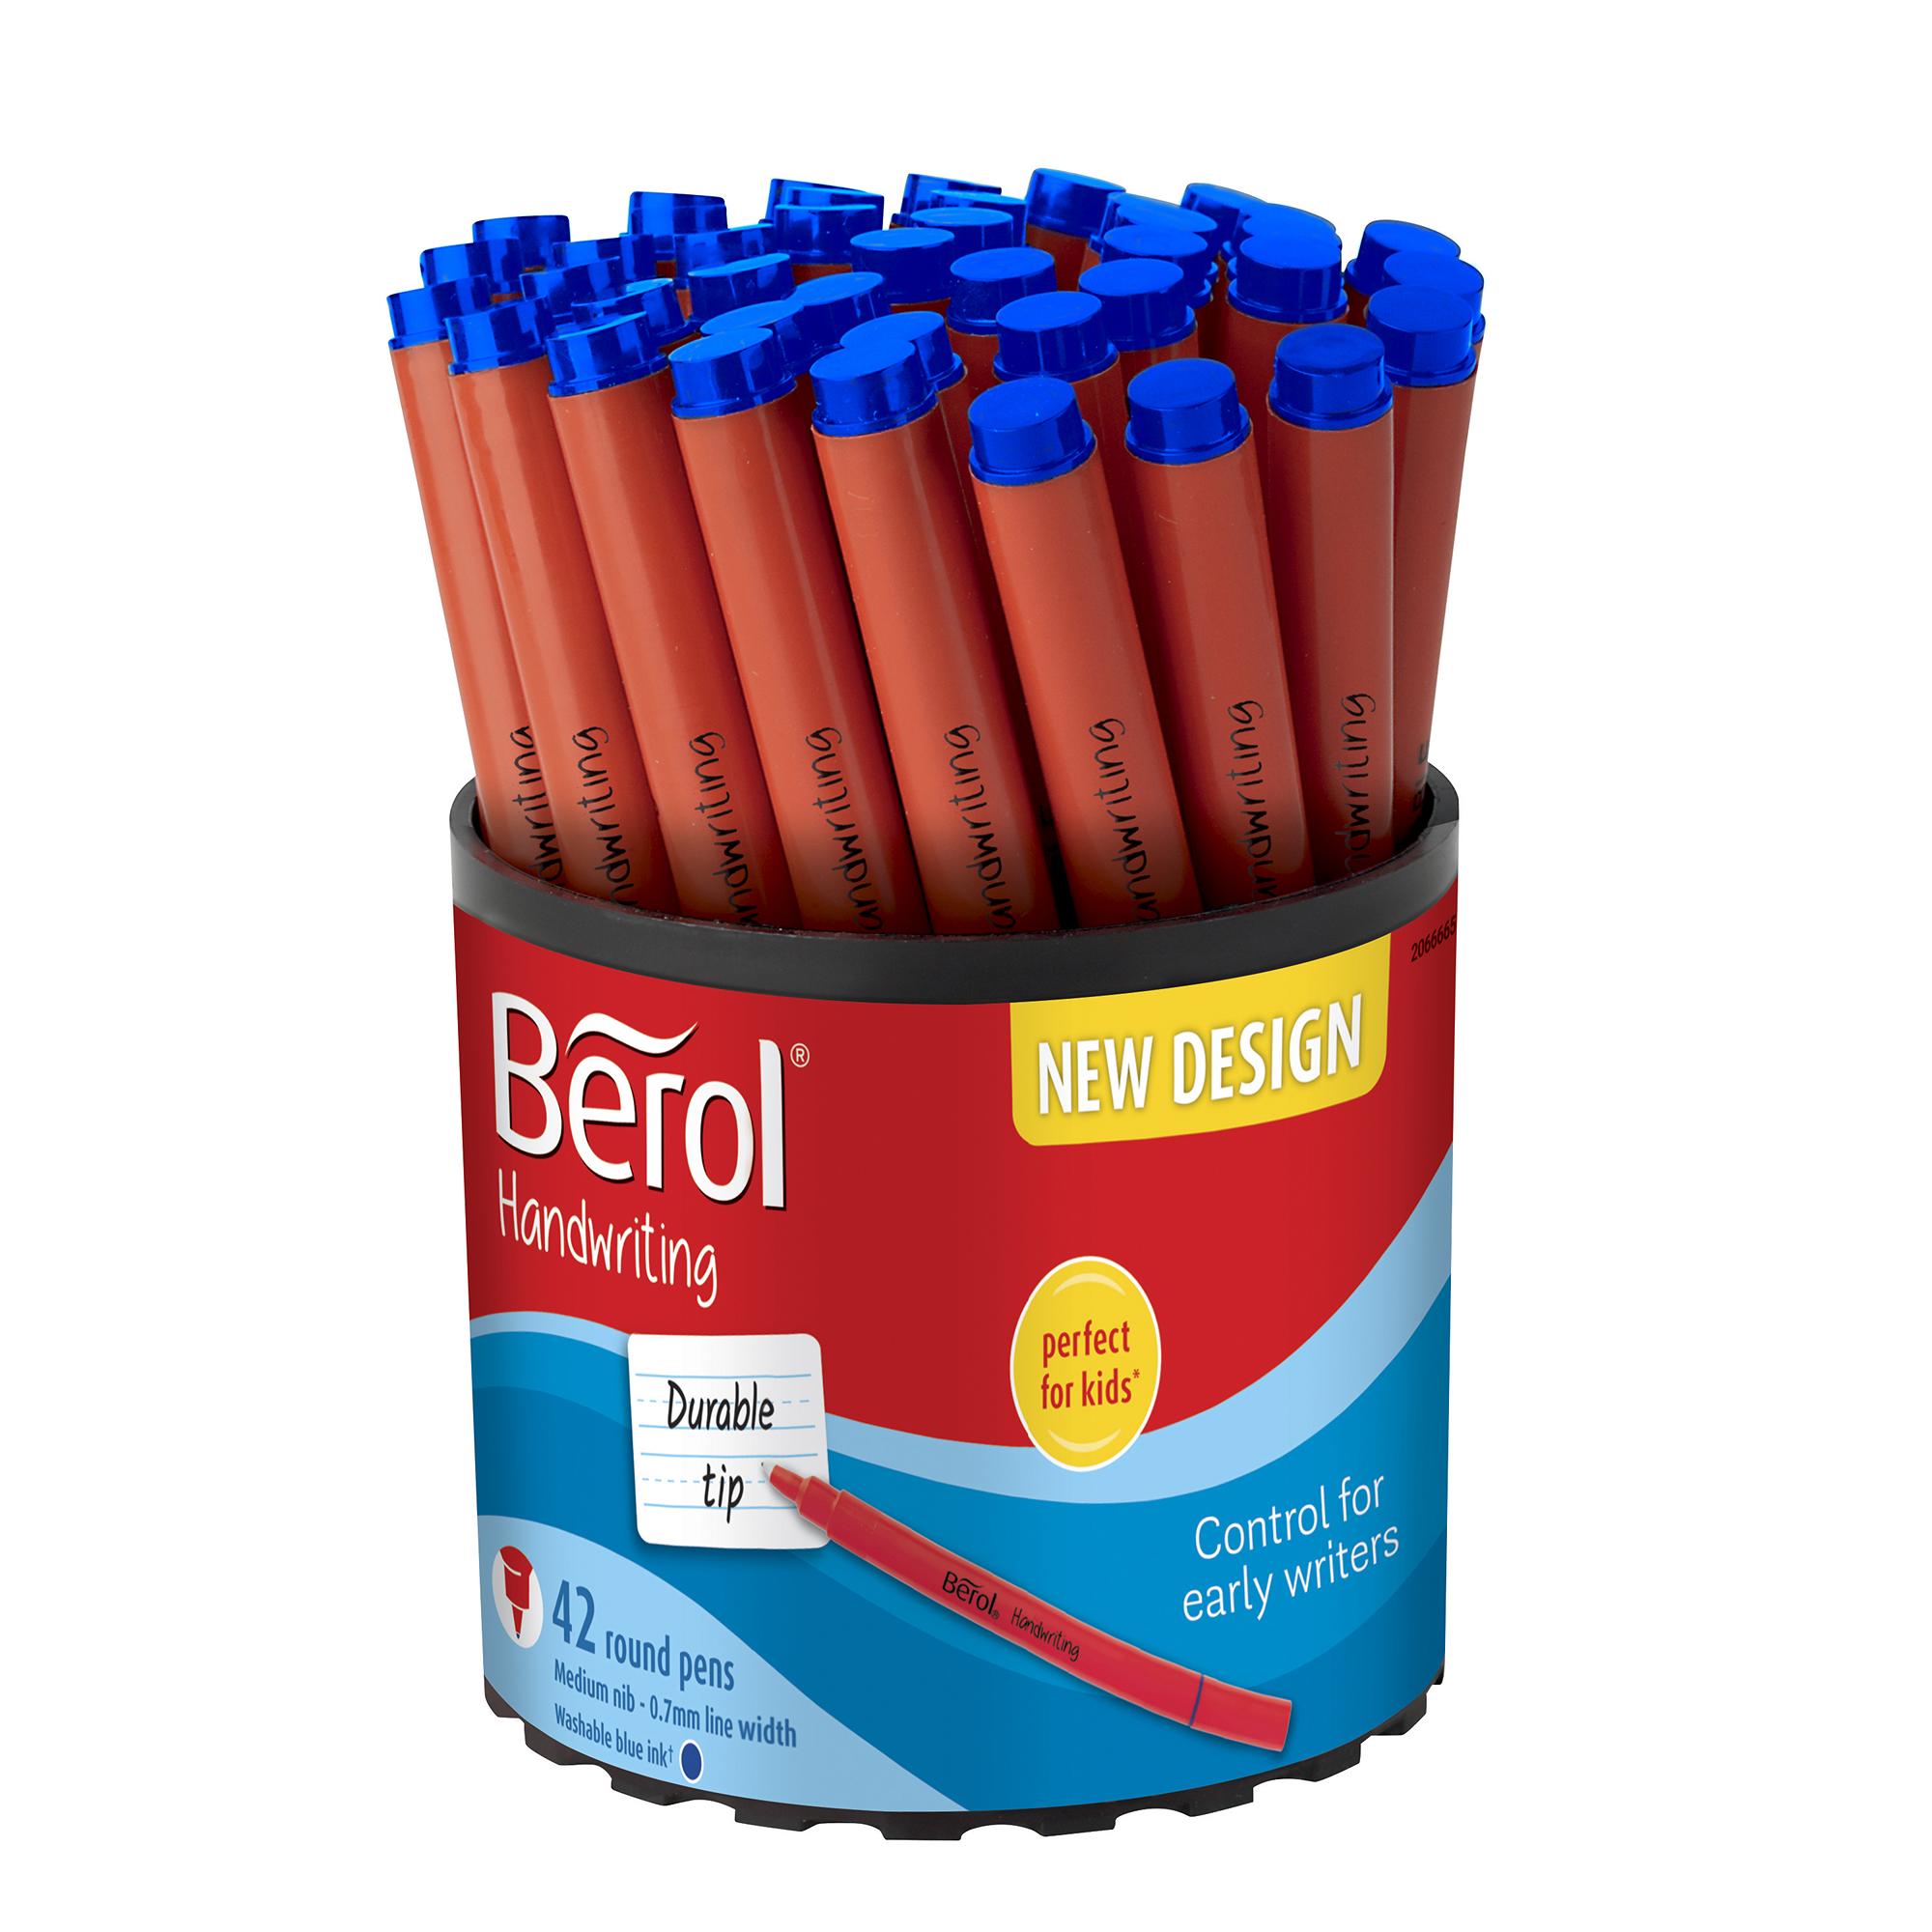 Berol Blue Cartridge Handwriting Pen New Arrivals Brand New